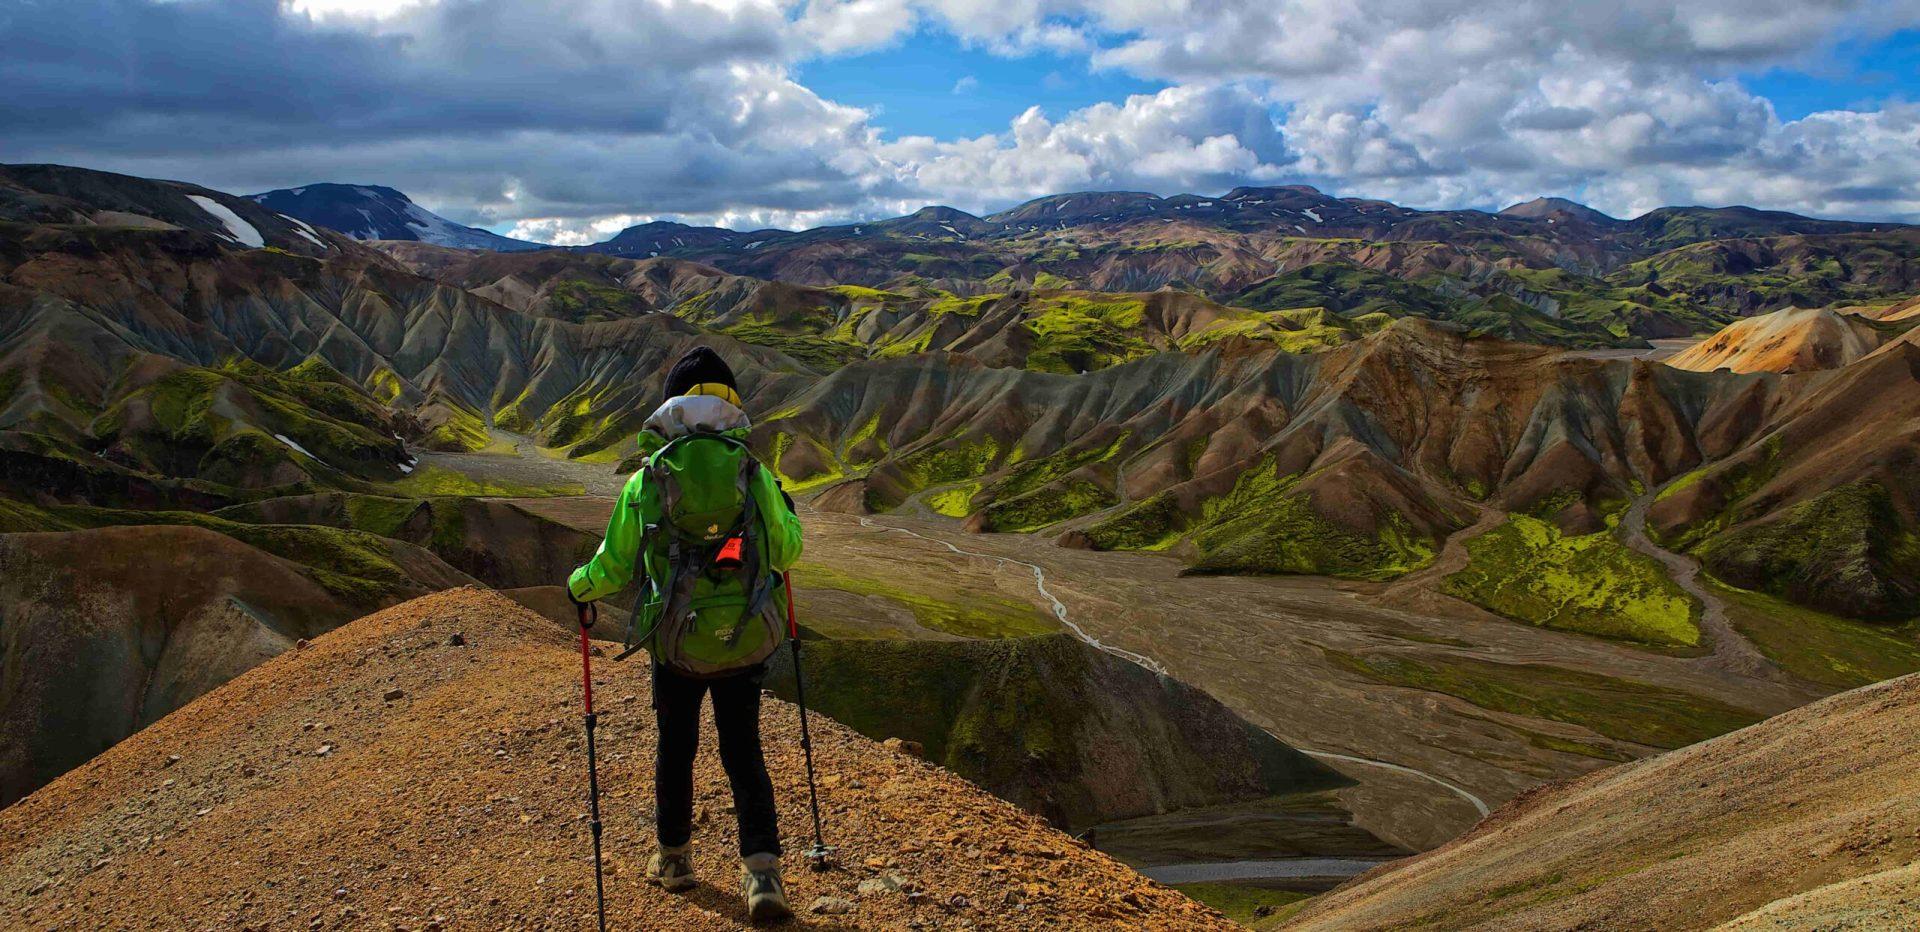 Highland Hiking in Iceland